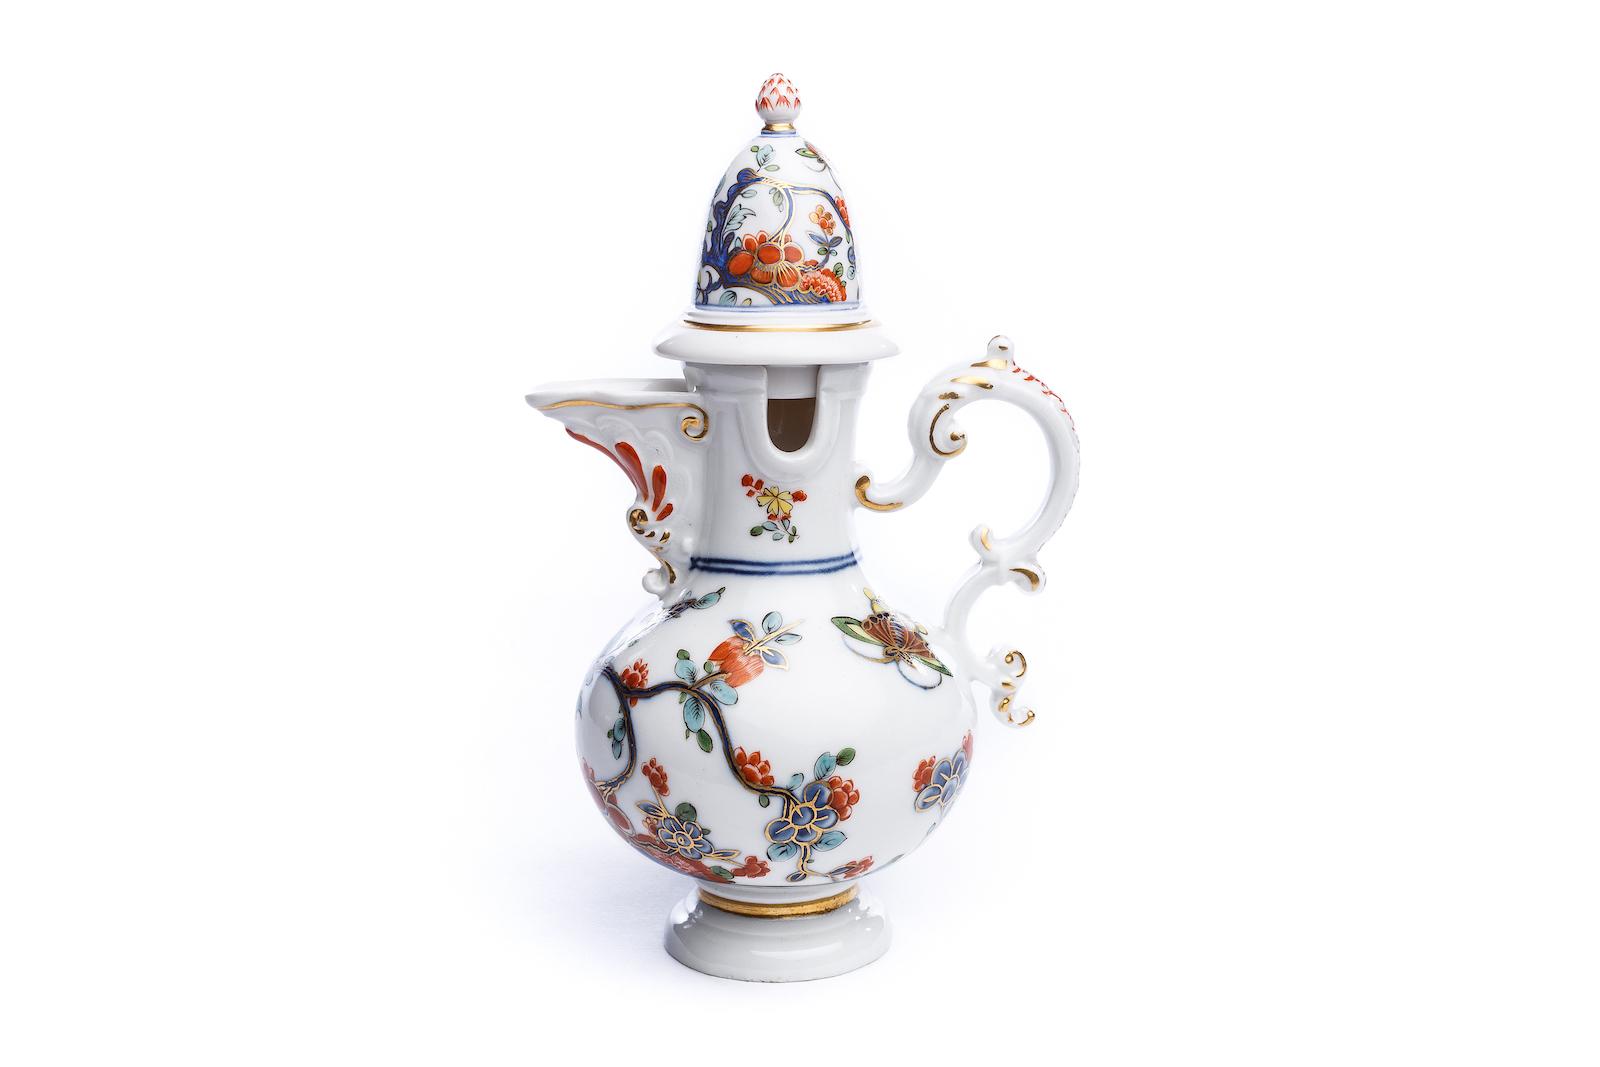 #158 Seltene Deckelkanne, Meissen 1735   Rare lidded jug, Meissen 1735 Image